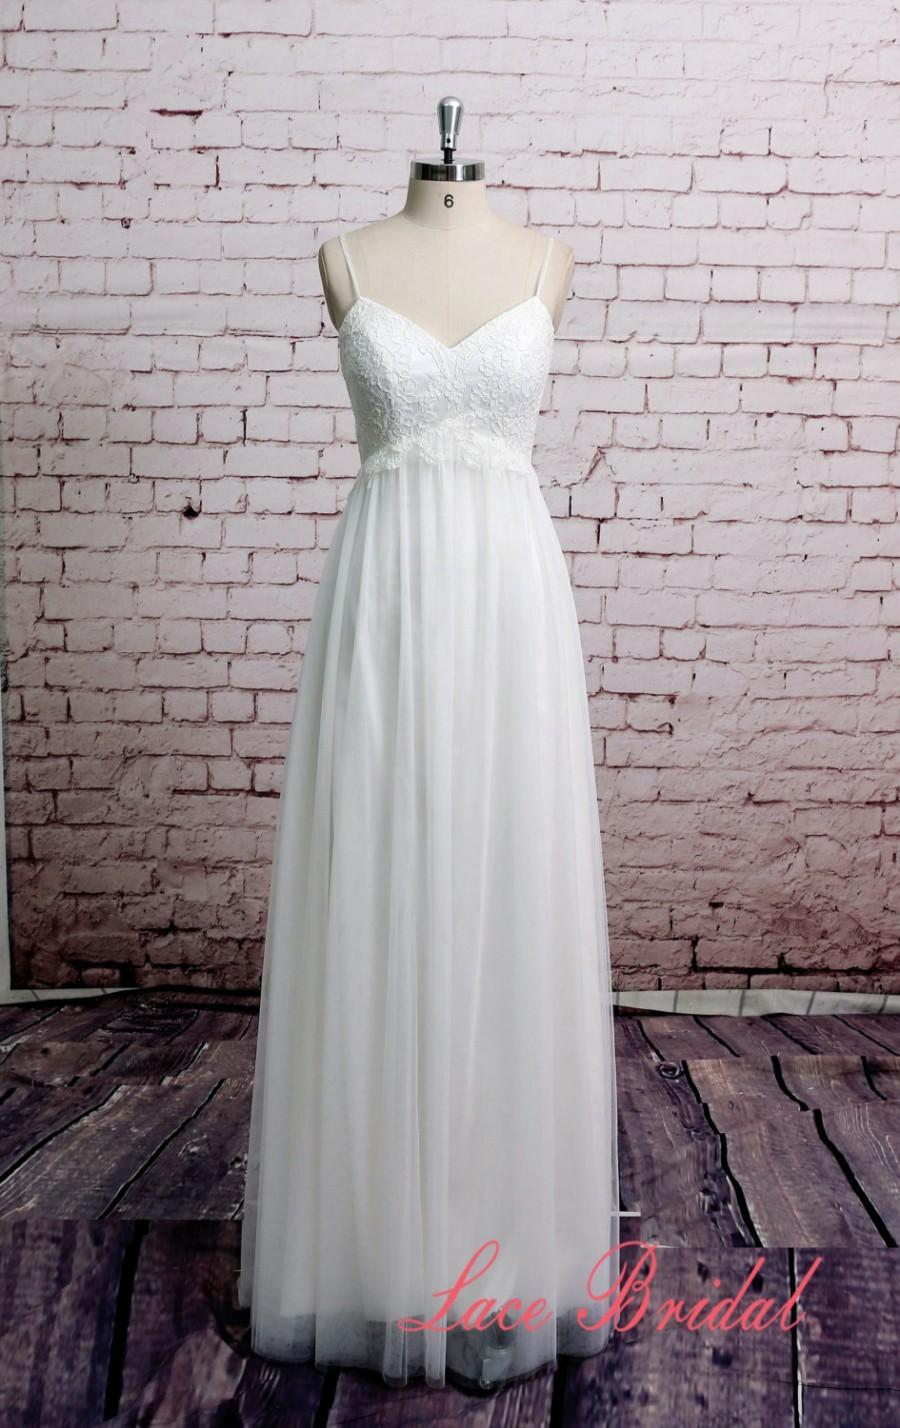 Wedding - Spaghetti Straps Wedding Dress Tulle Skirt Bridal Gown Beach Style Wedding Dress A-line Outside Wedding Gown